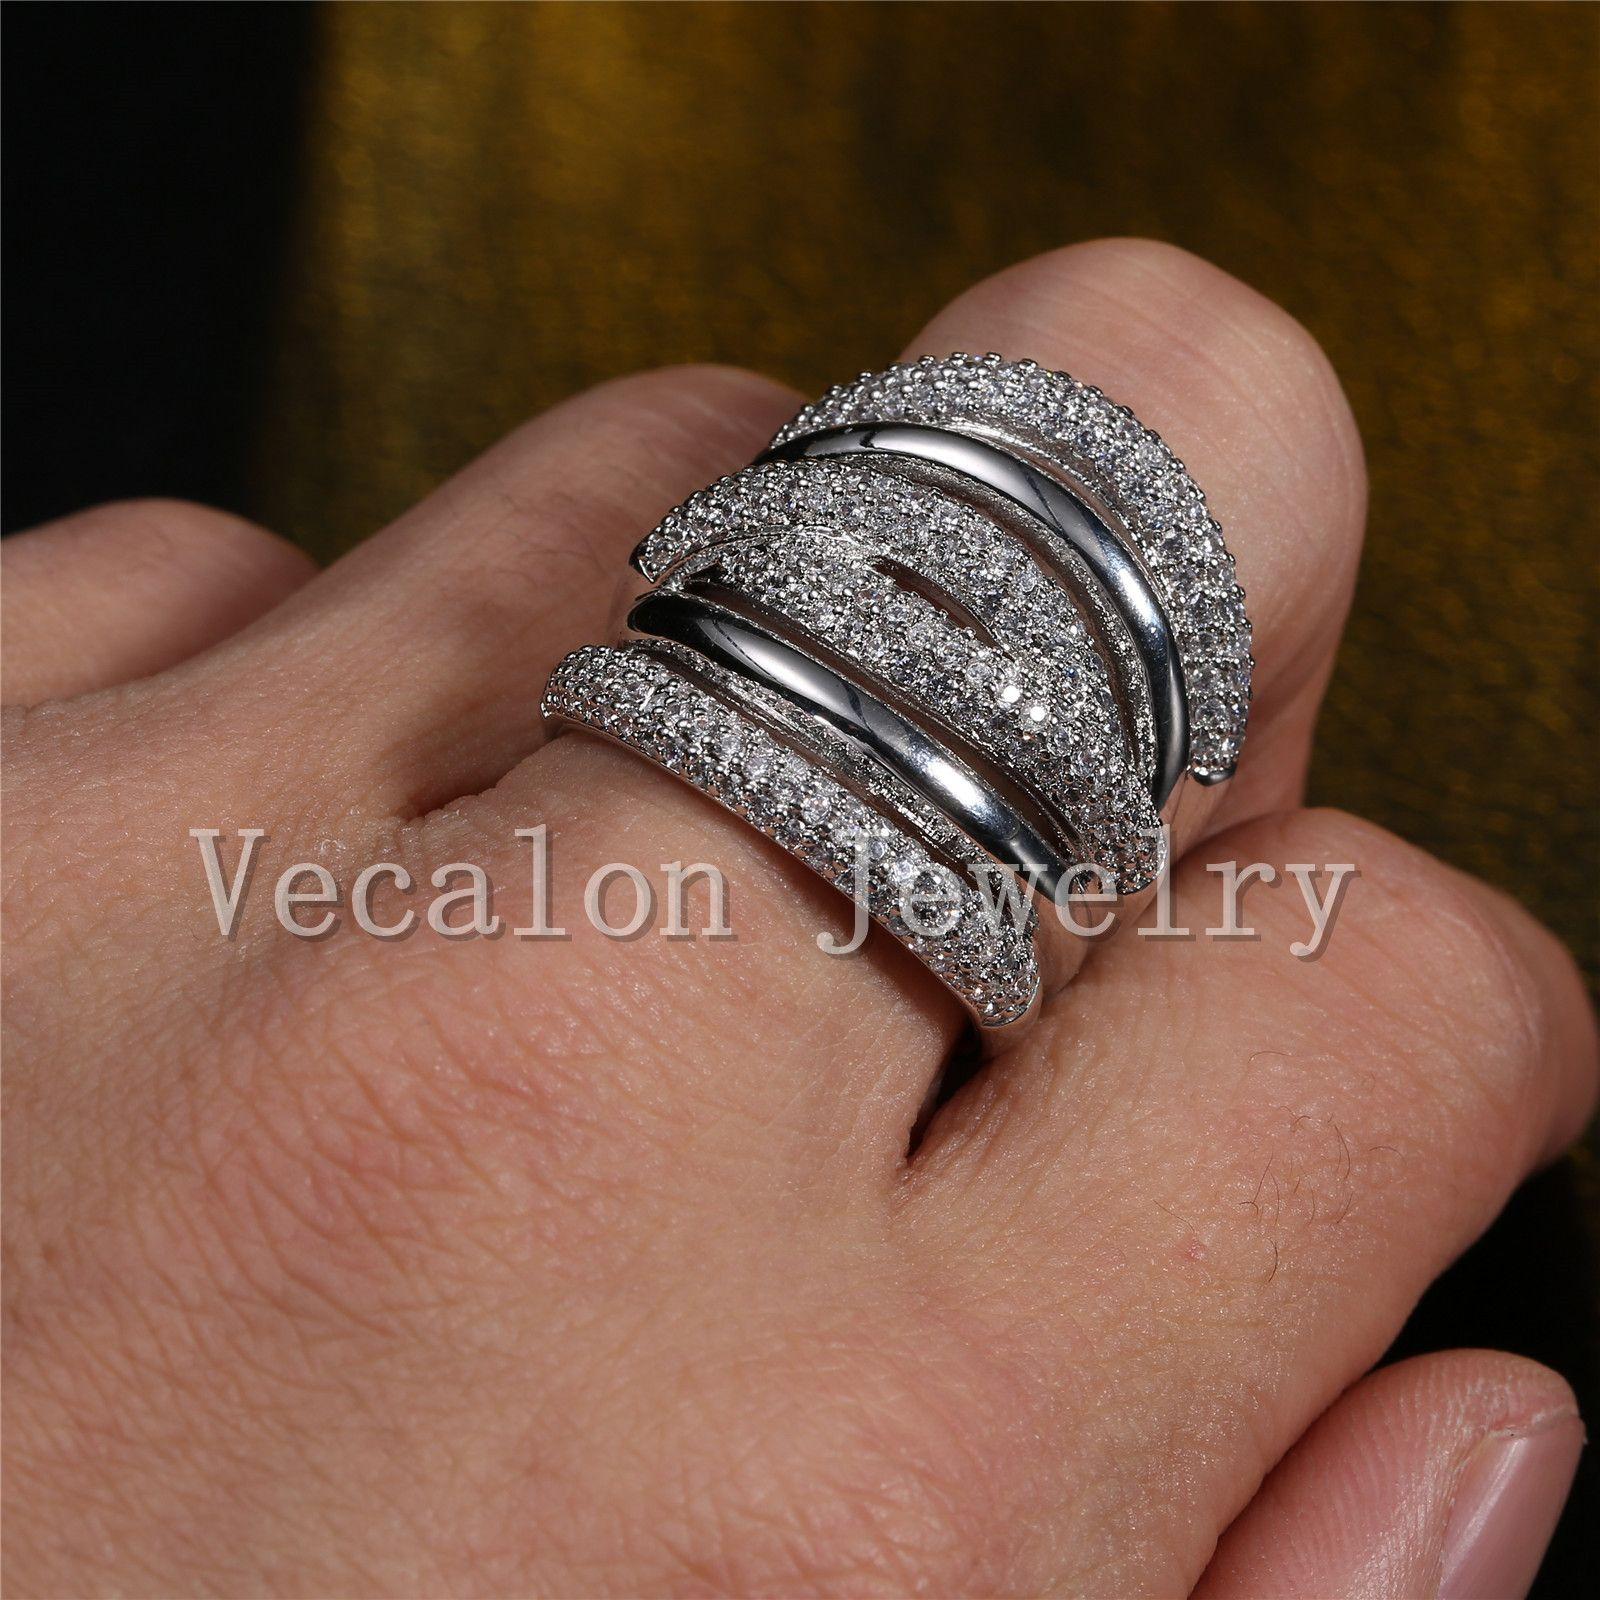 Vecalon 포장 세트 토파즈 시뮬레이션 된 다이아몬드 Cz 크로스 약혼 결혼 반지 여자 14KT 화이트 골드 채워진 여성 밴드 반지